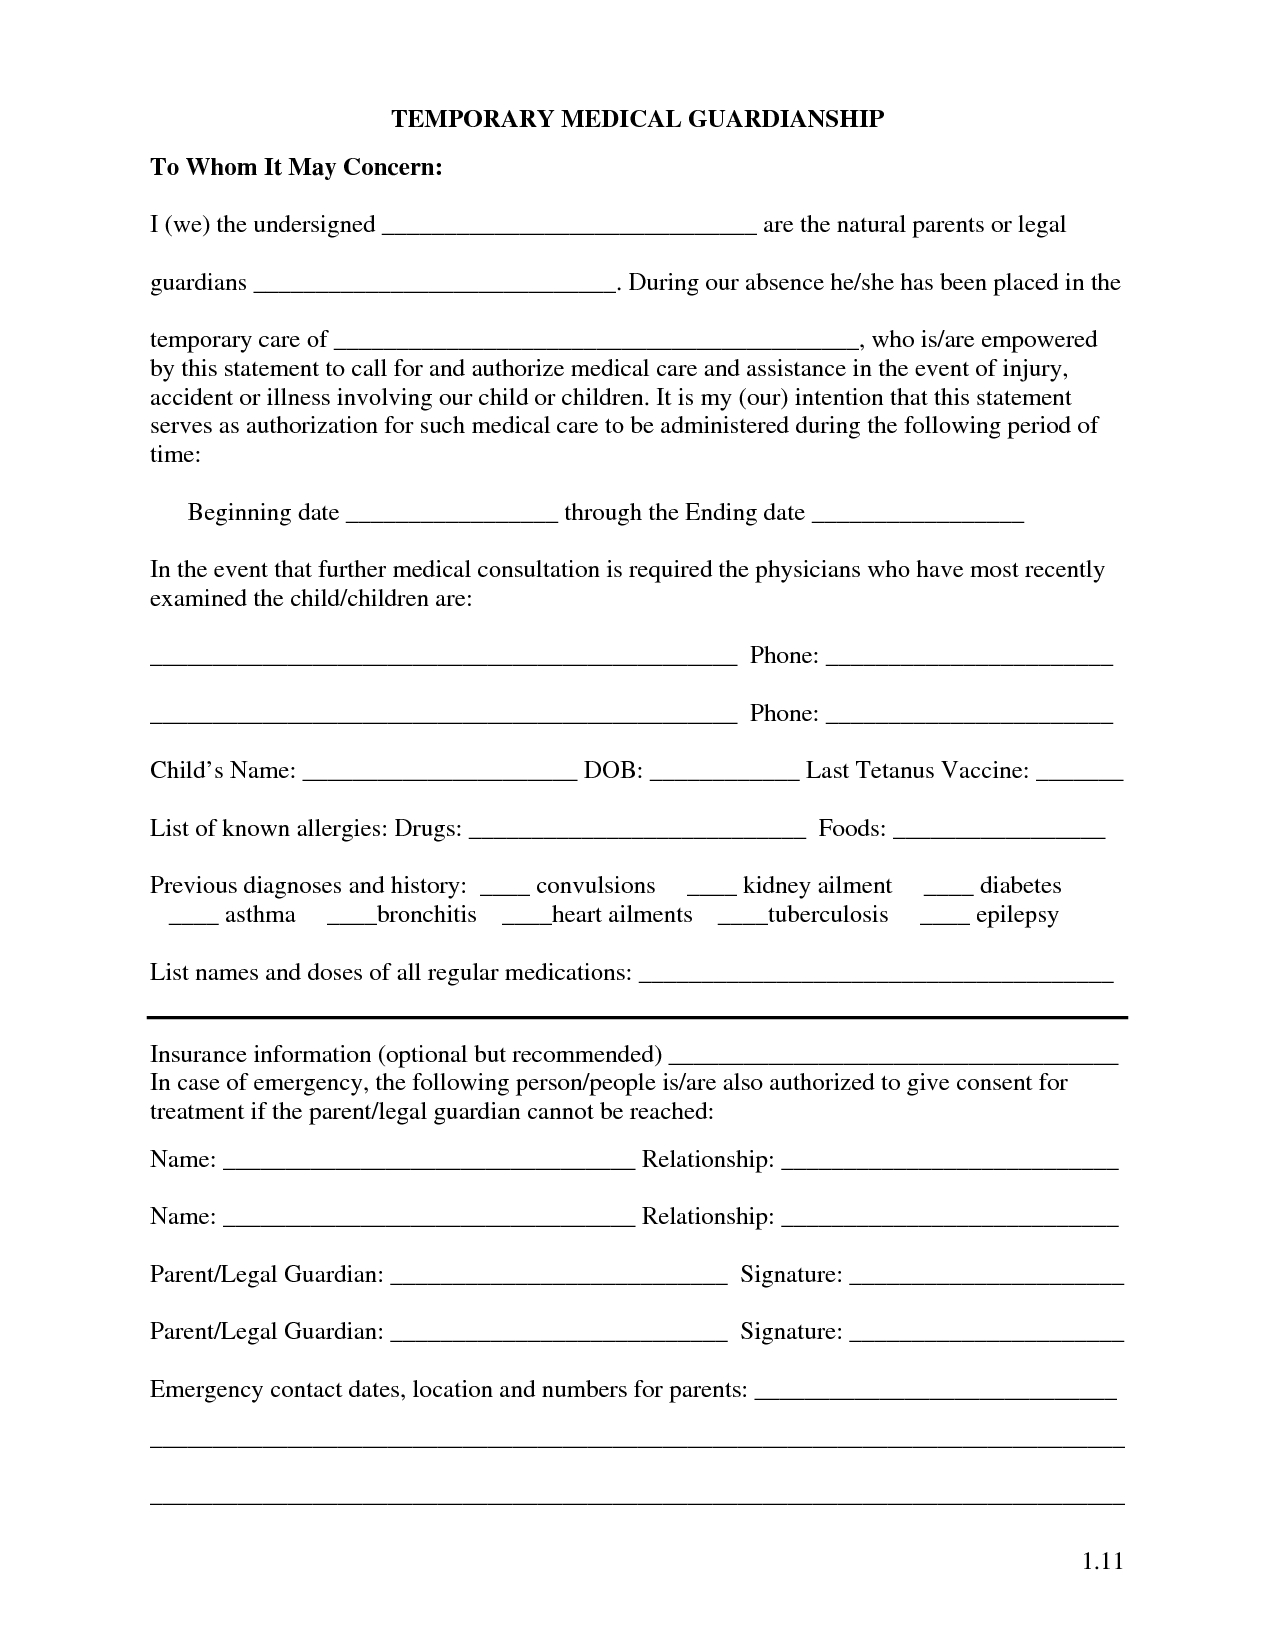 Free Printable Temporary Guardianship Forms | Forms - Free Printable Child Guardianship Forms